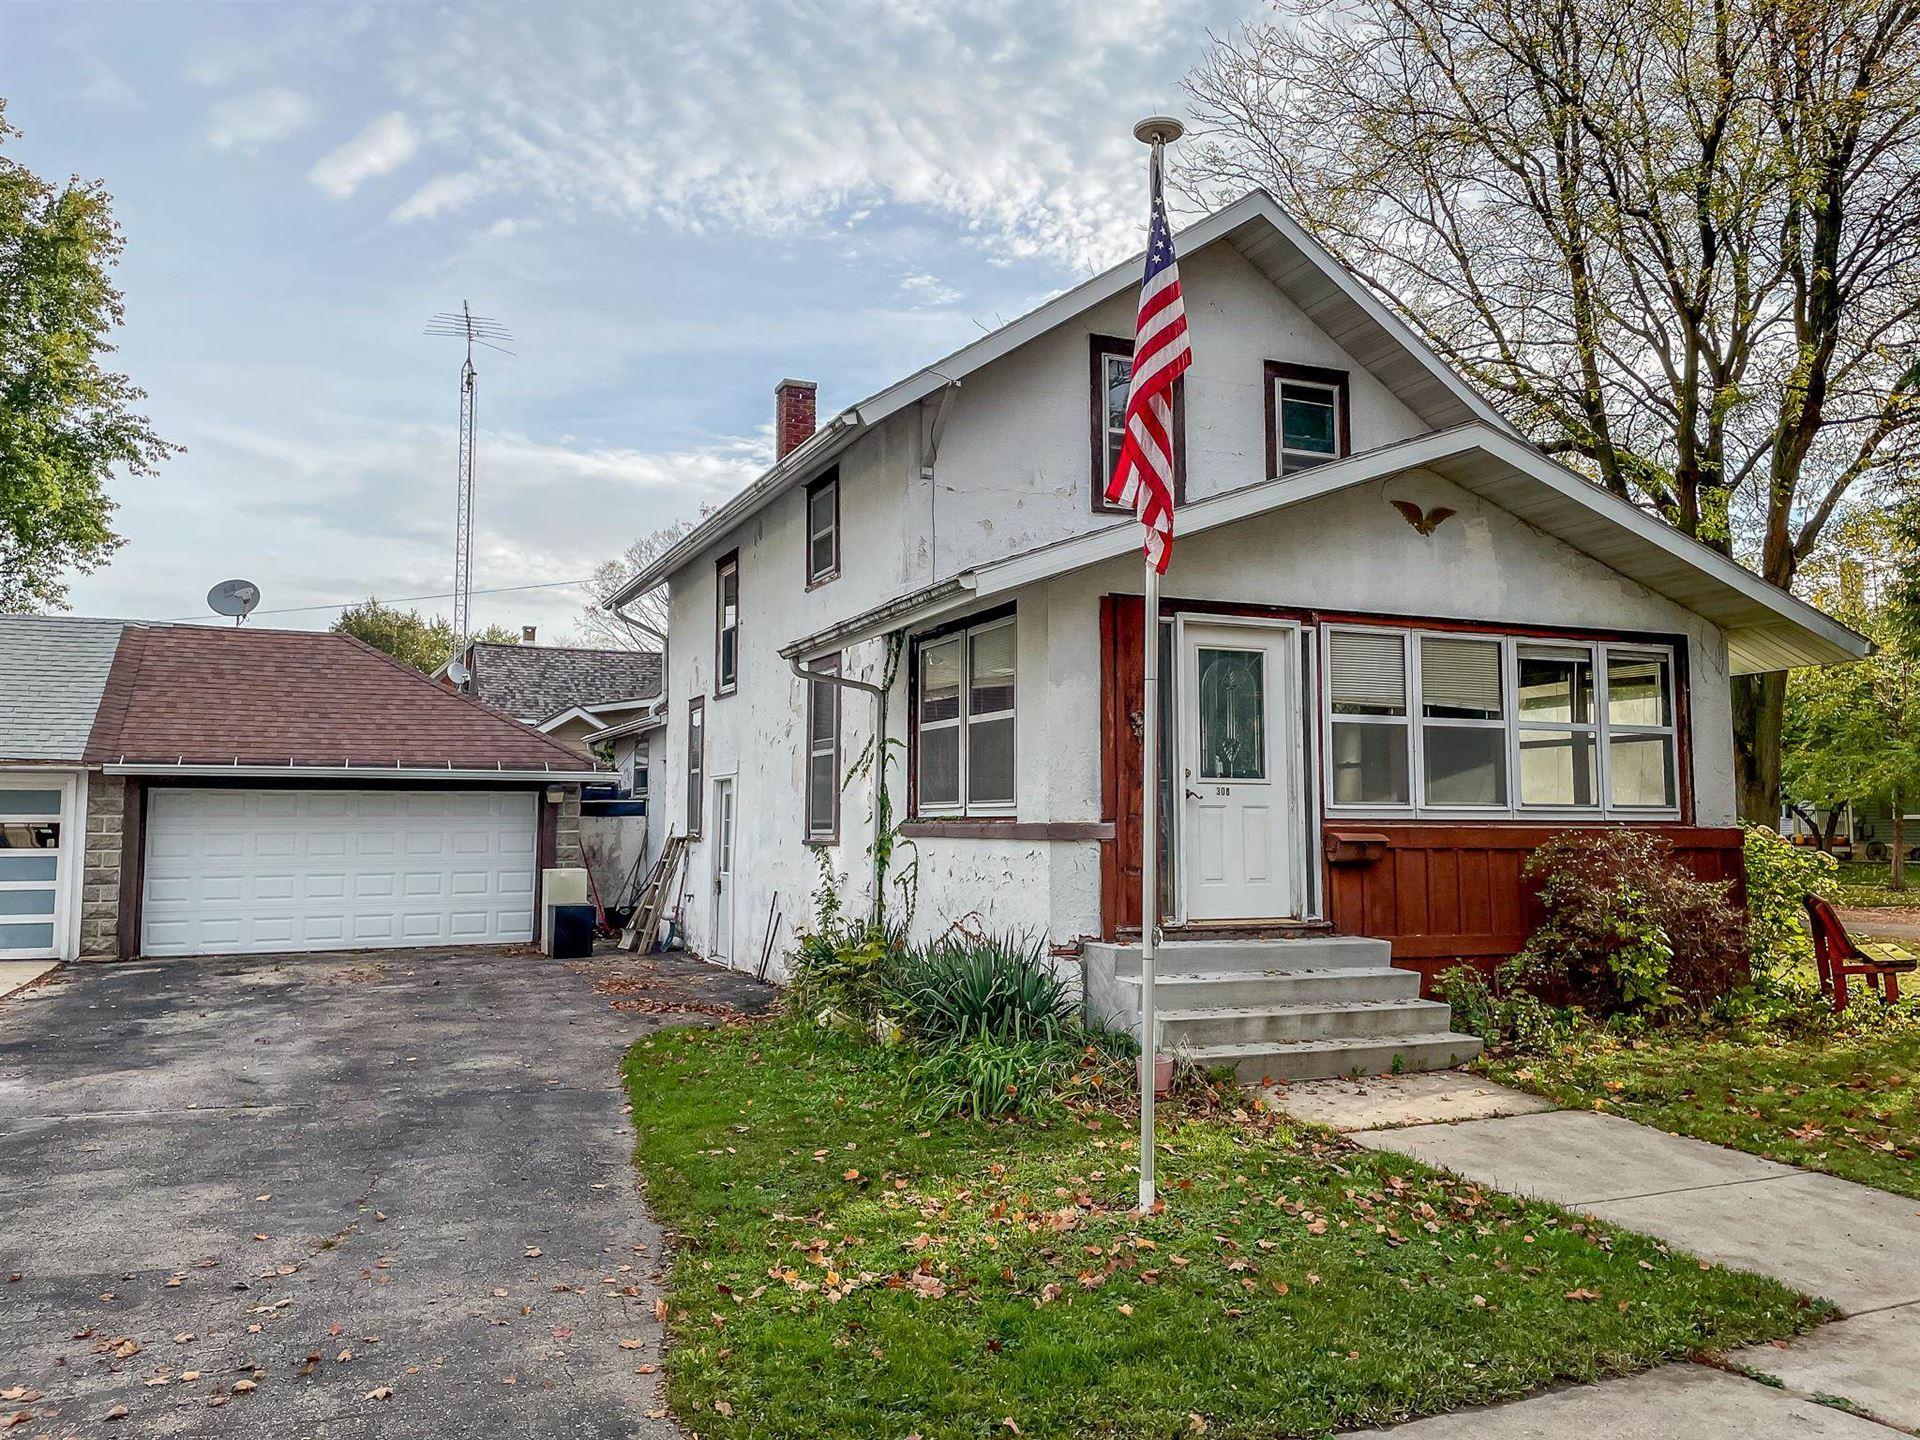 306 W Prairie St, Columbus, WI 53925 - #: 1921980